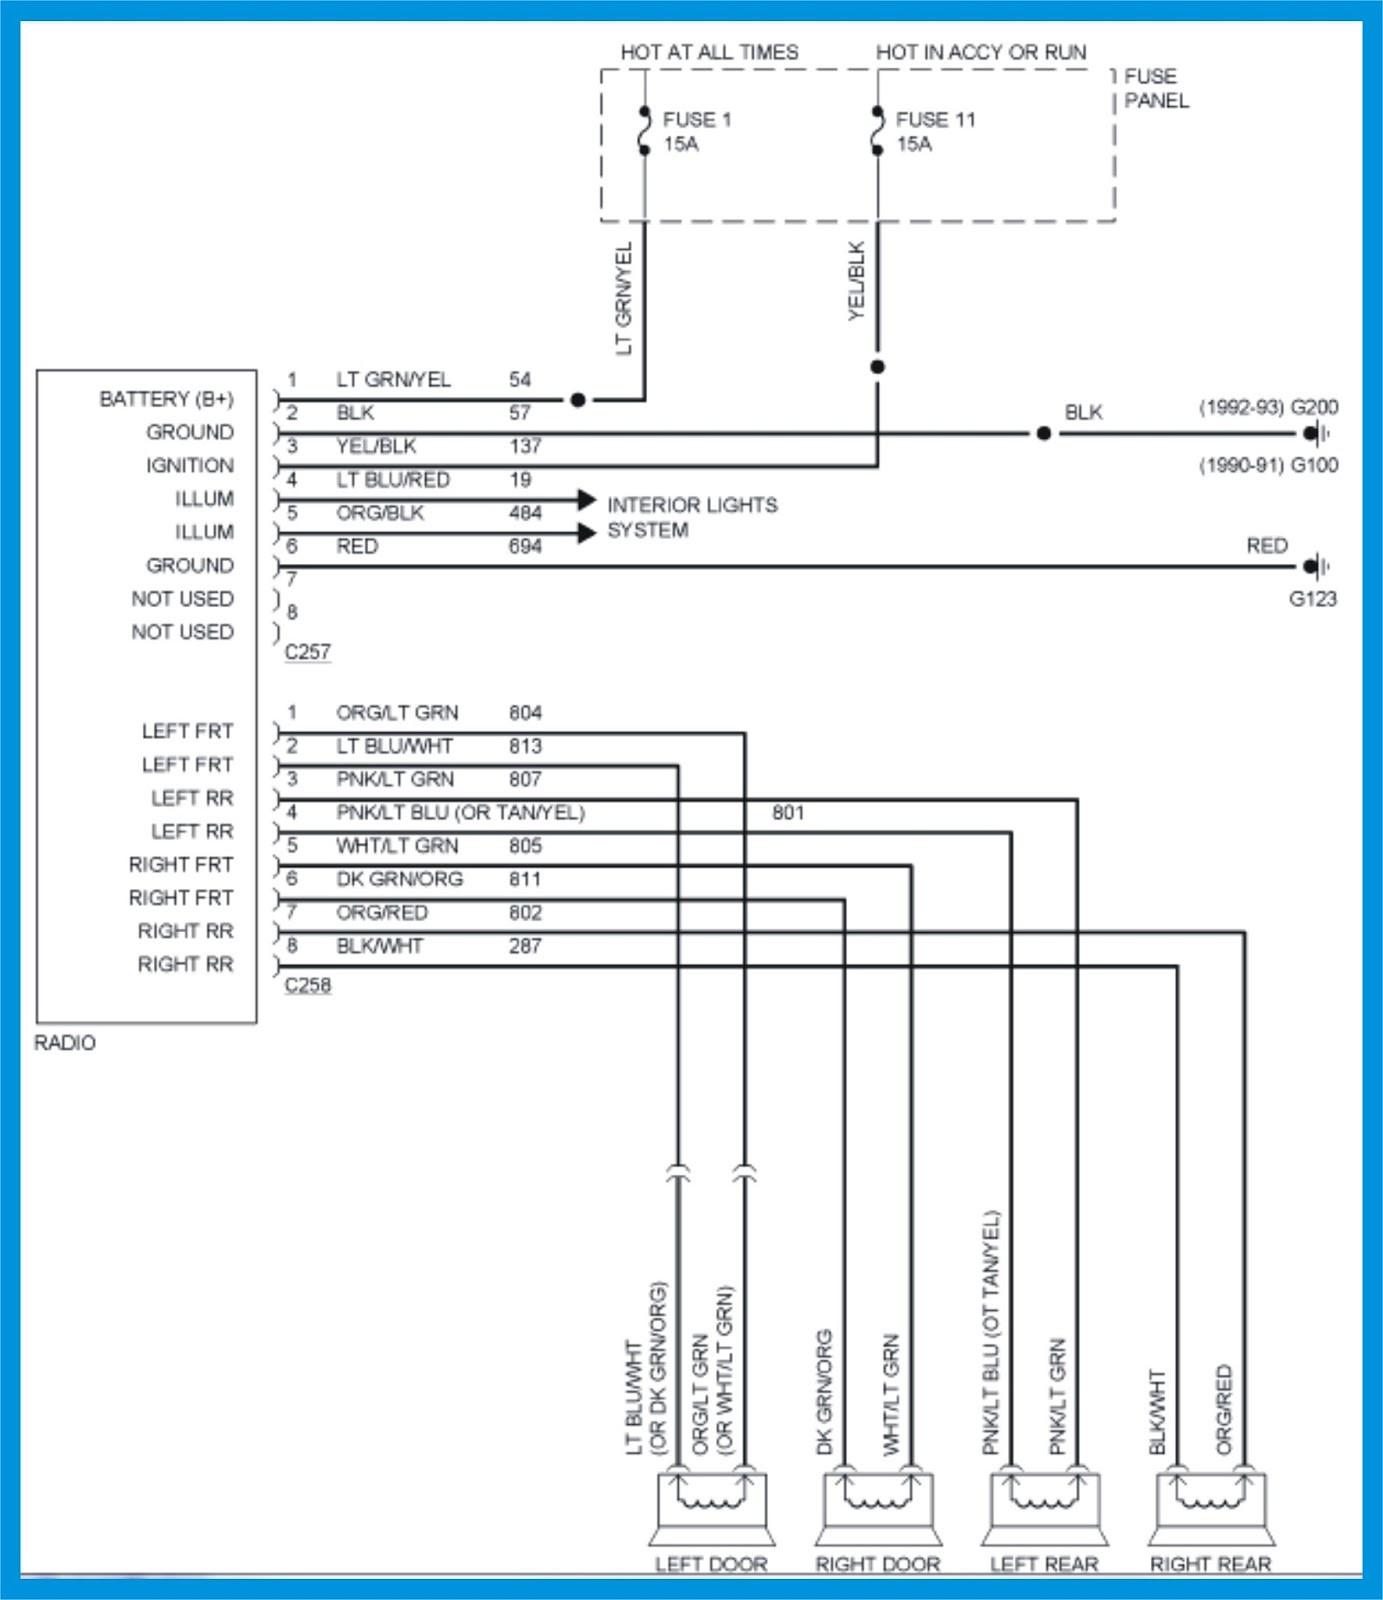 [DIAGRAM_3US]  Geo Radio Wiring - Wiring Diagrams | 2001 Chevy Prizm Stereo Wiring Diagram |  | week.pass.lesvignoblesguimberteau.fr